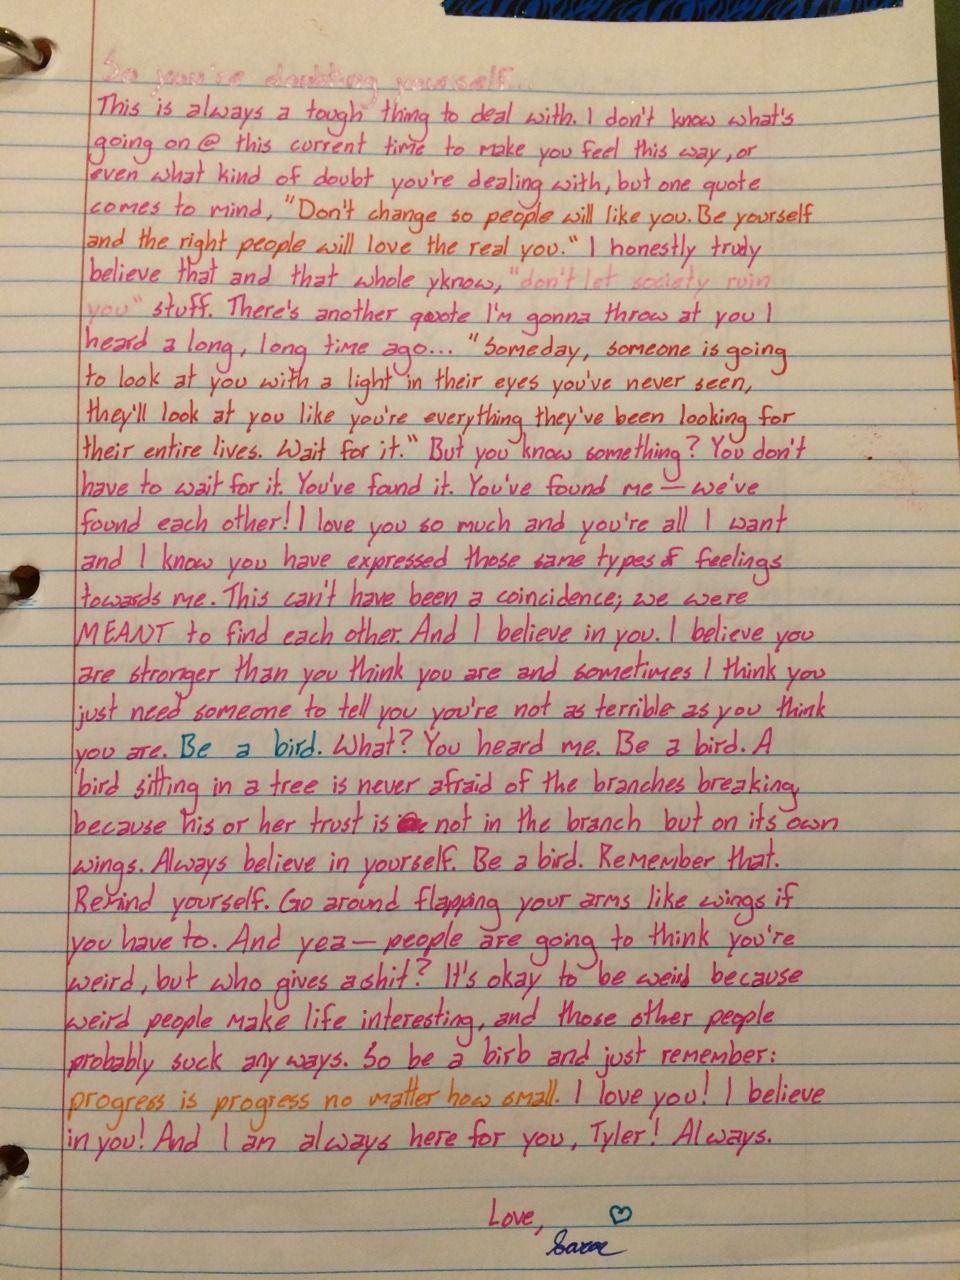 Cute Letter For Boyfriend On His Birthday Birthday Letter For Girlfriend Birthday Letters To Boyfriend Letters To Boyfriend